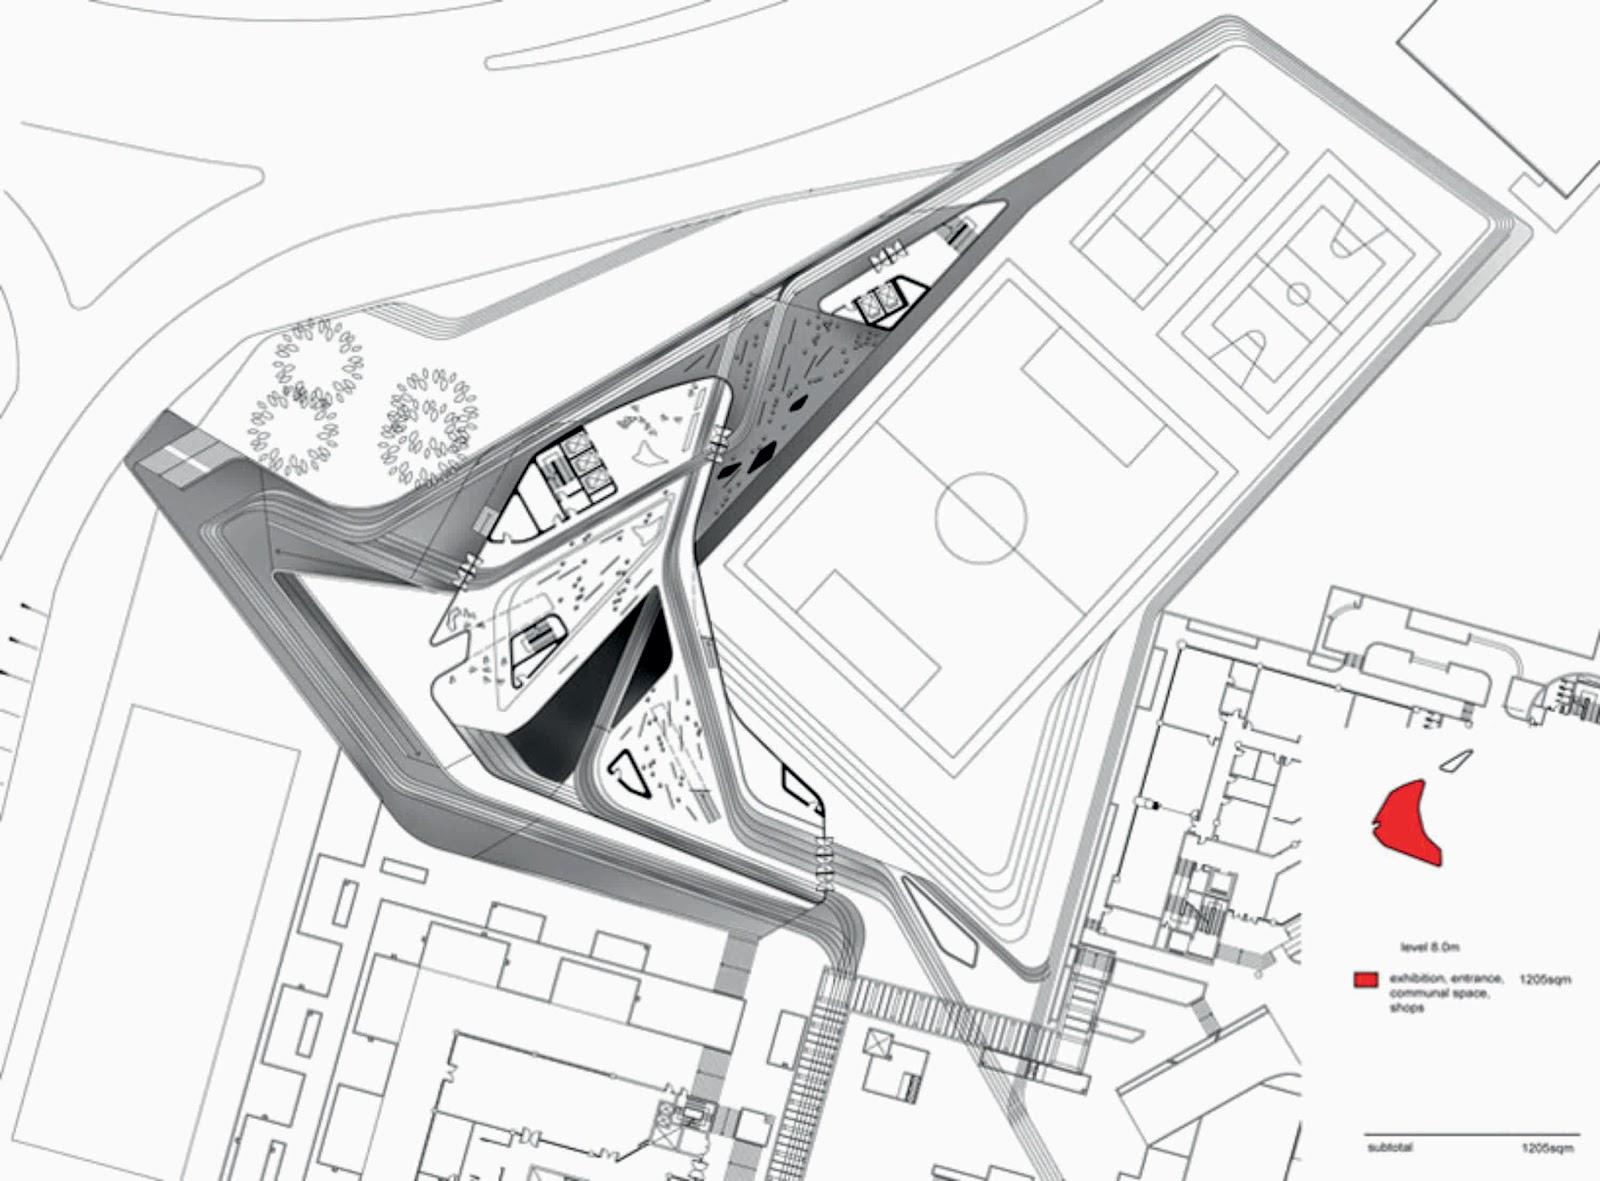 Jockey Club Innovation Tower By Zaha Hadid Aasarchitecture